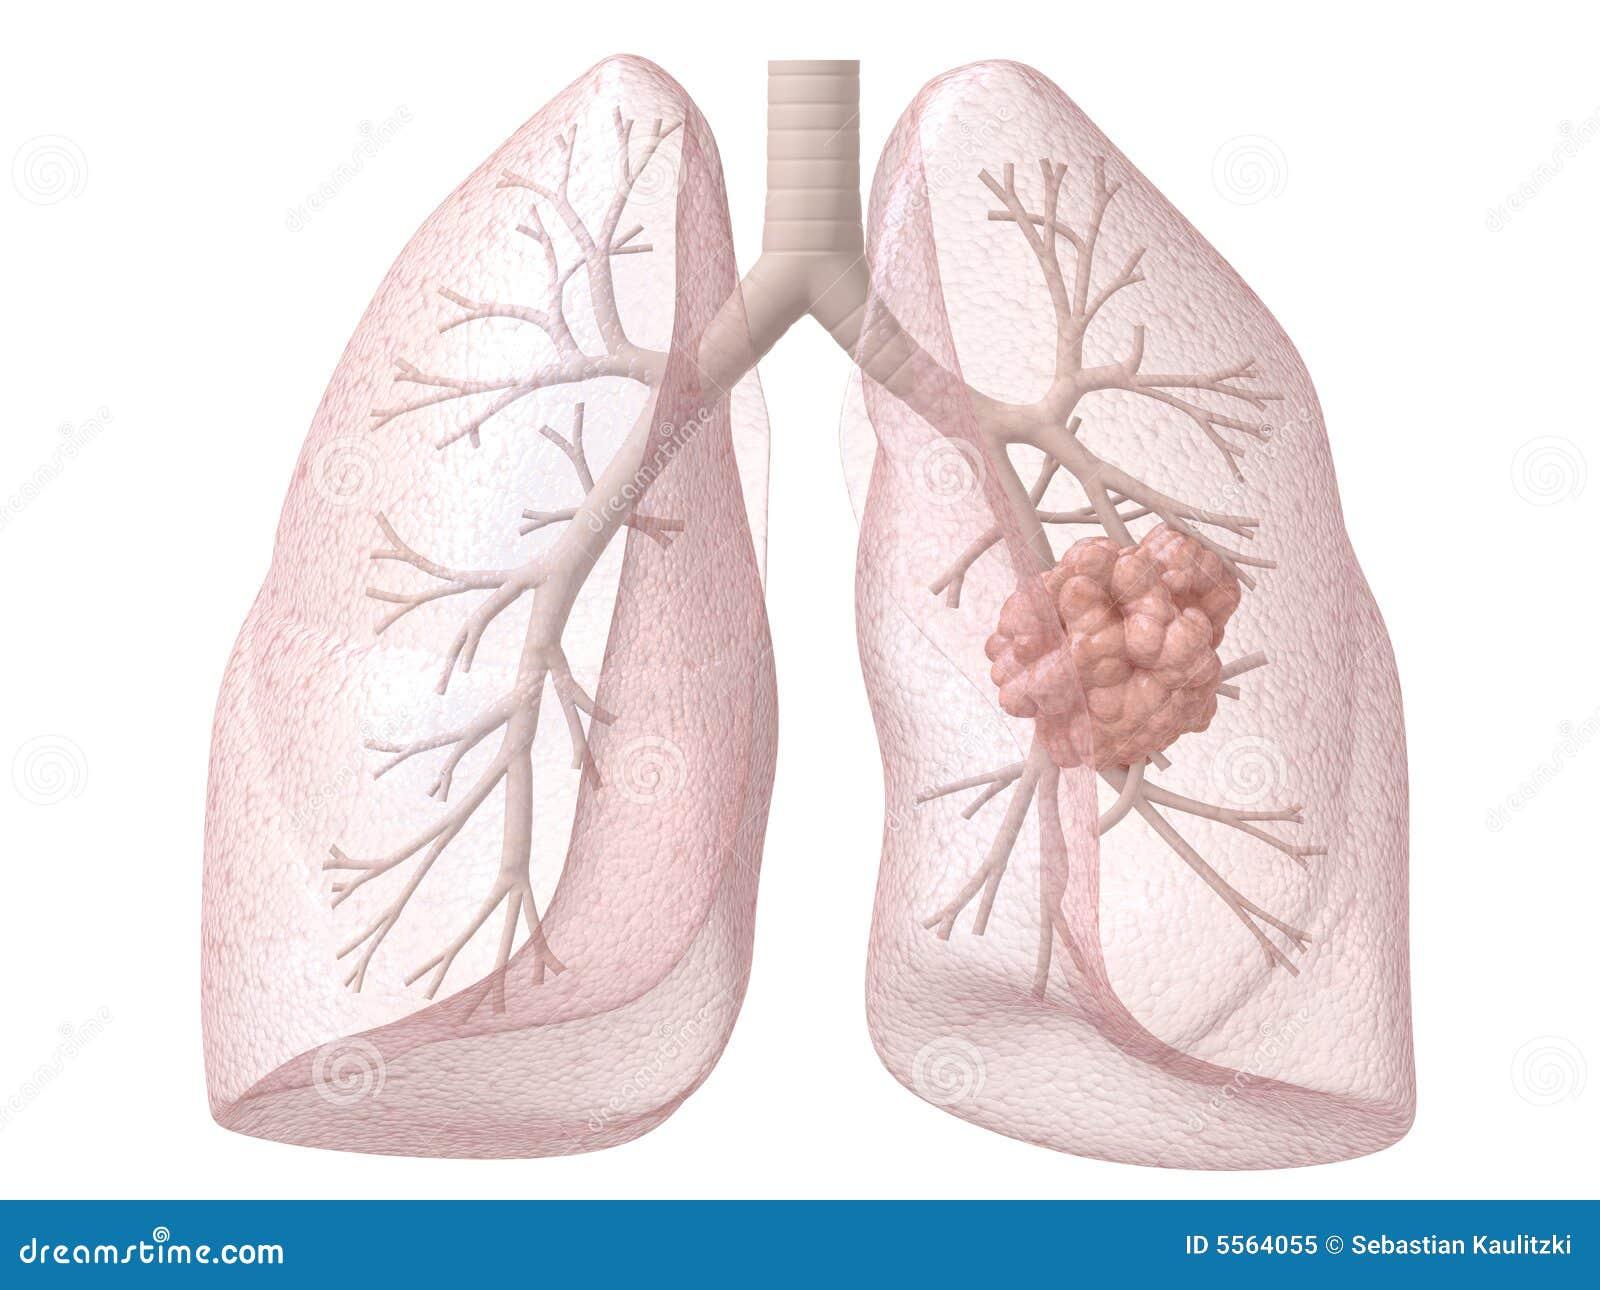 Großartig Anatomy And Physiology Of Lung Cancer Ideen - Menschliche ...